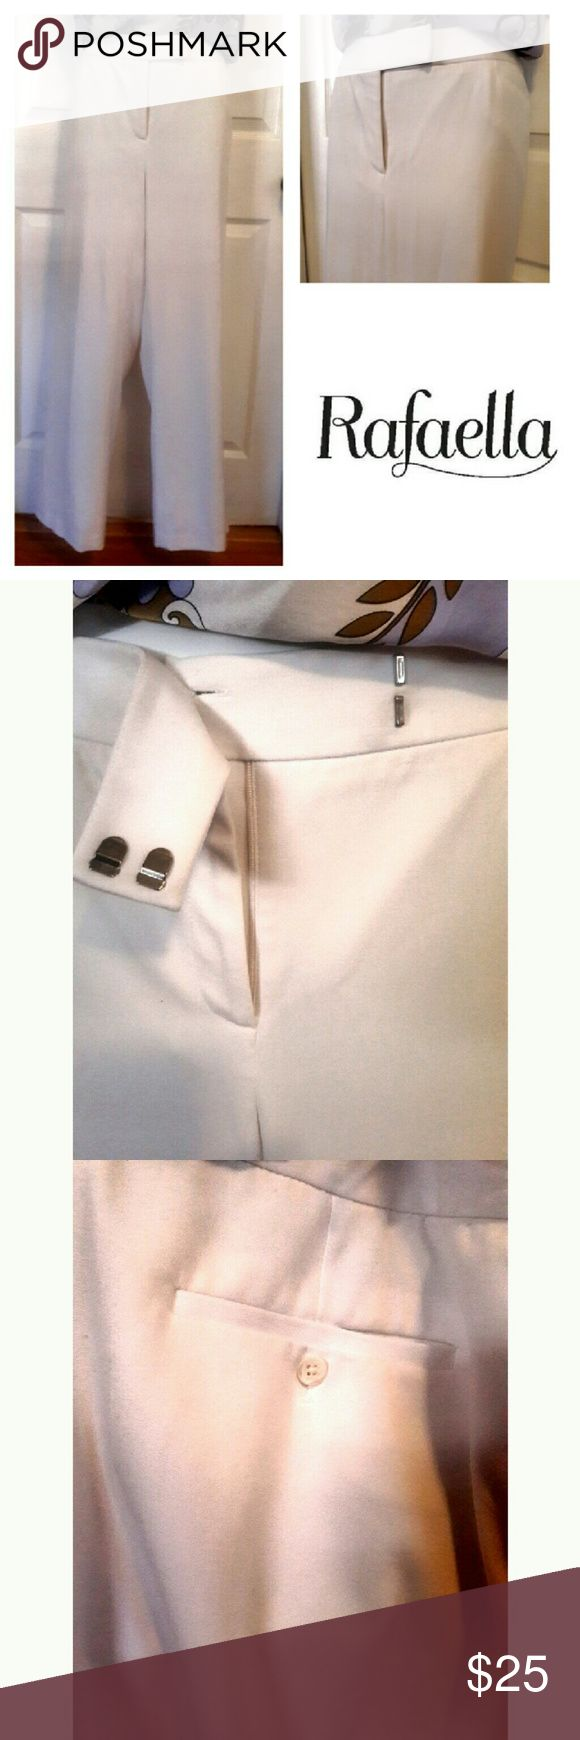 NWOT Rafaella White Dress pants NWOT Rafaella White Dress pants. Fully lined. Double button back pockets. Full front pockets. Size 16 Rafaella Pants